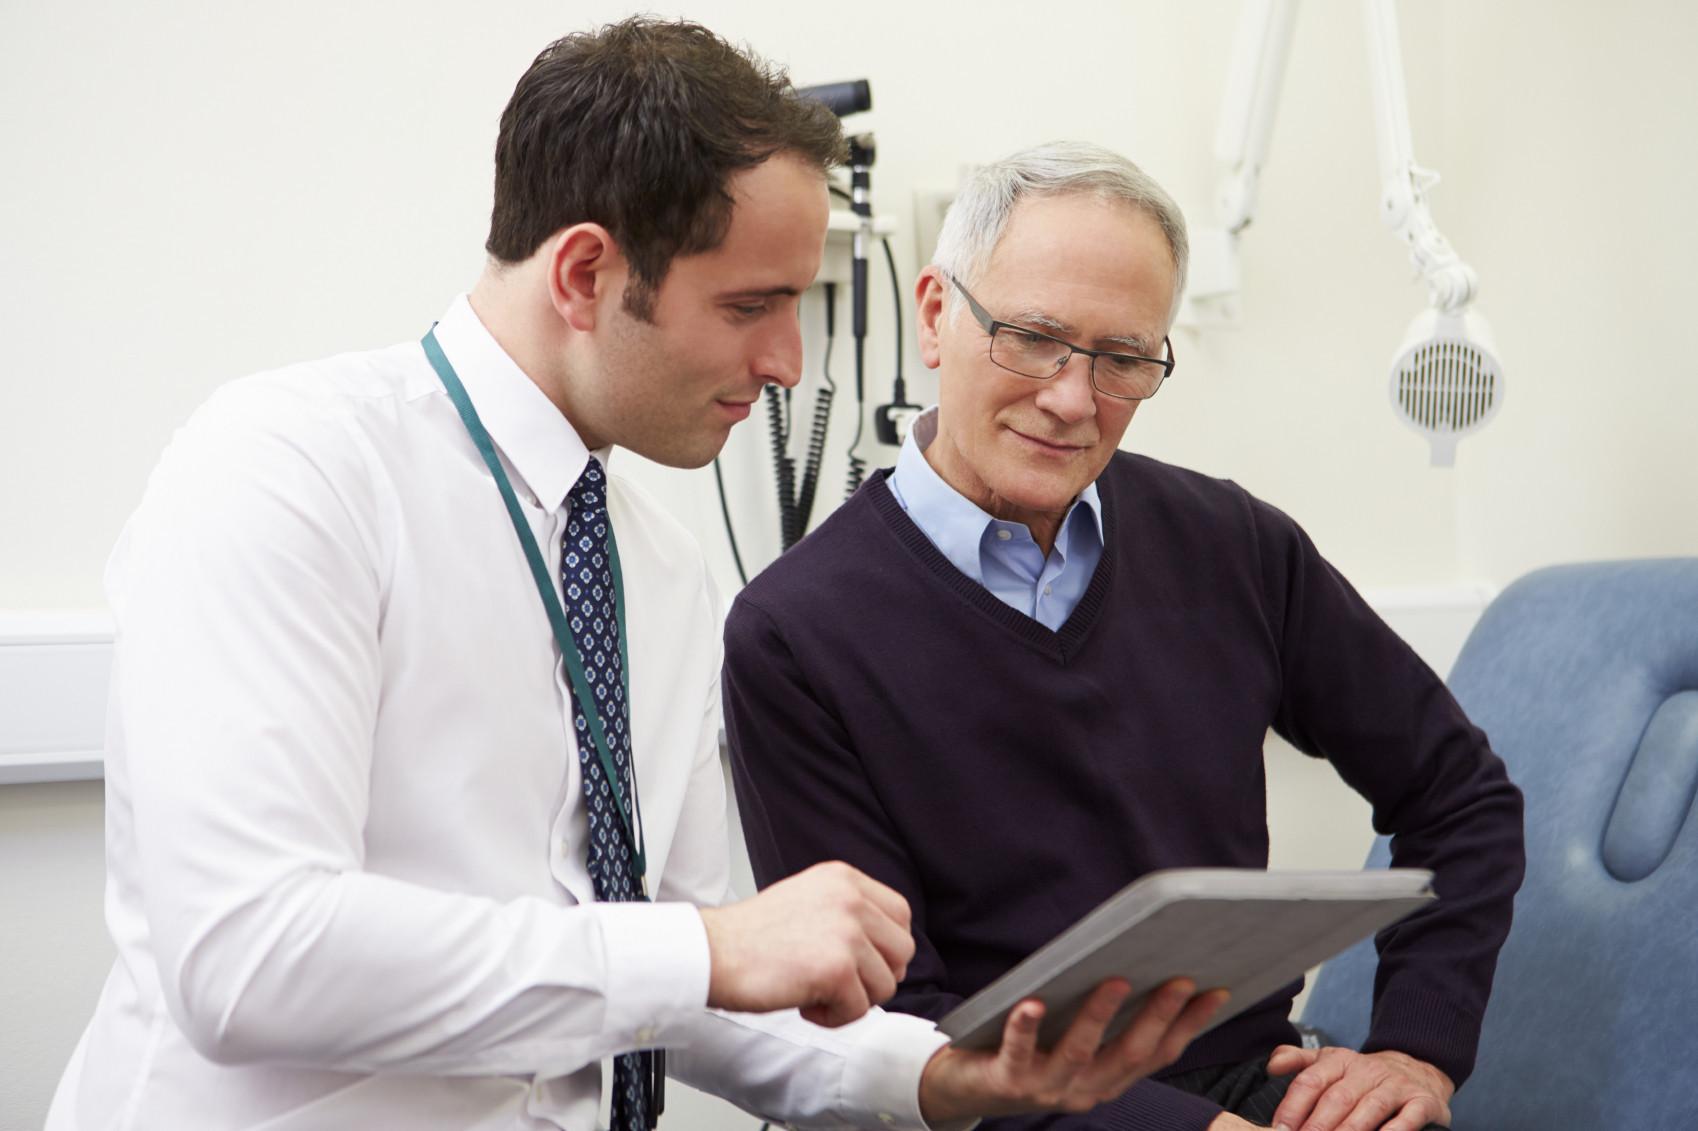 doctor-prostate-cancer-mens-iStock_000044019978_Medium1